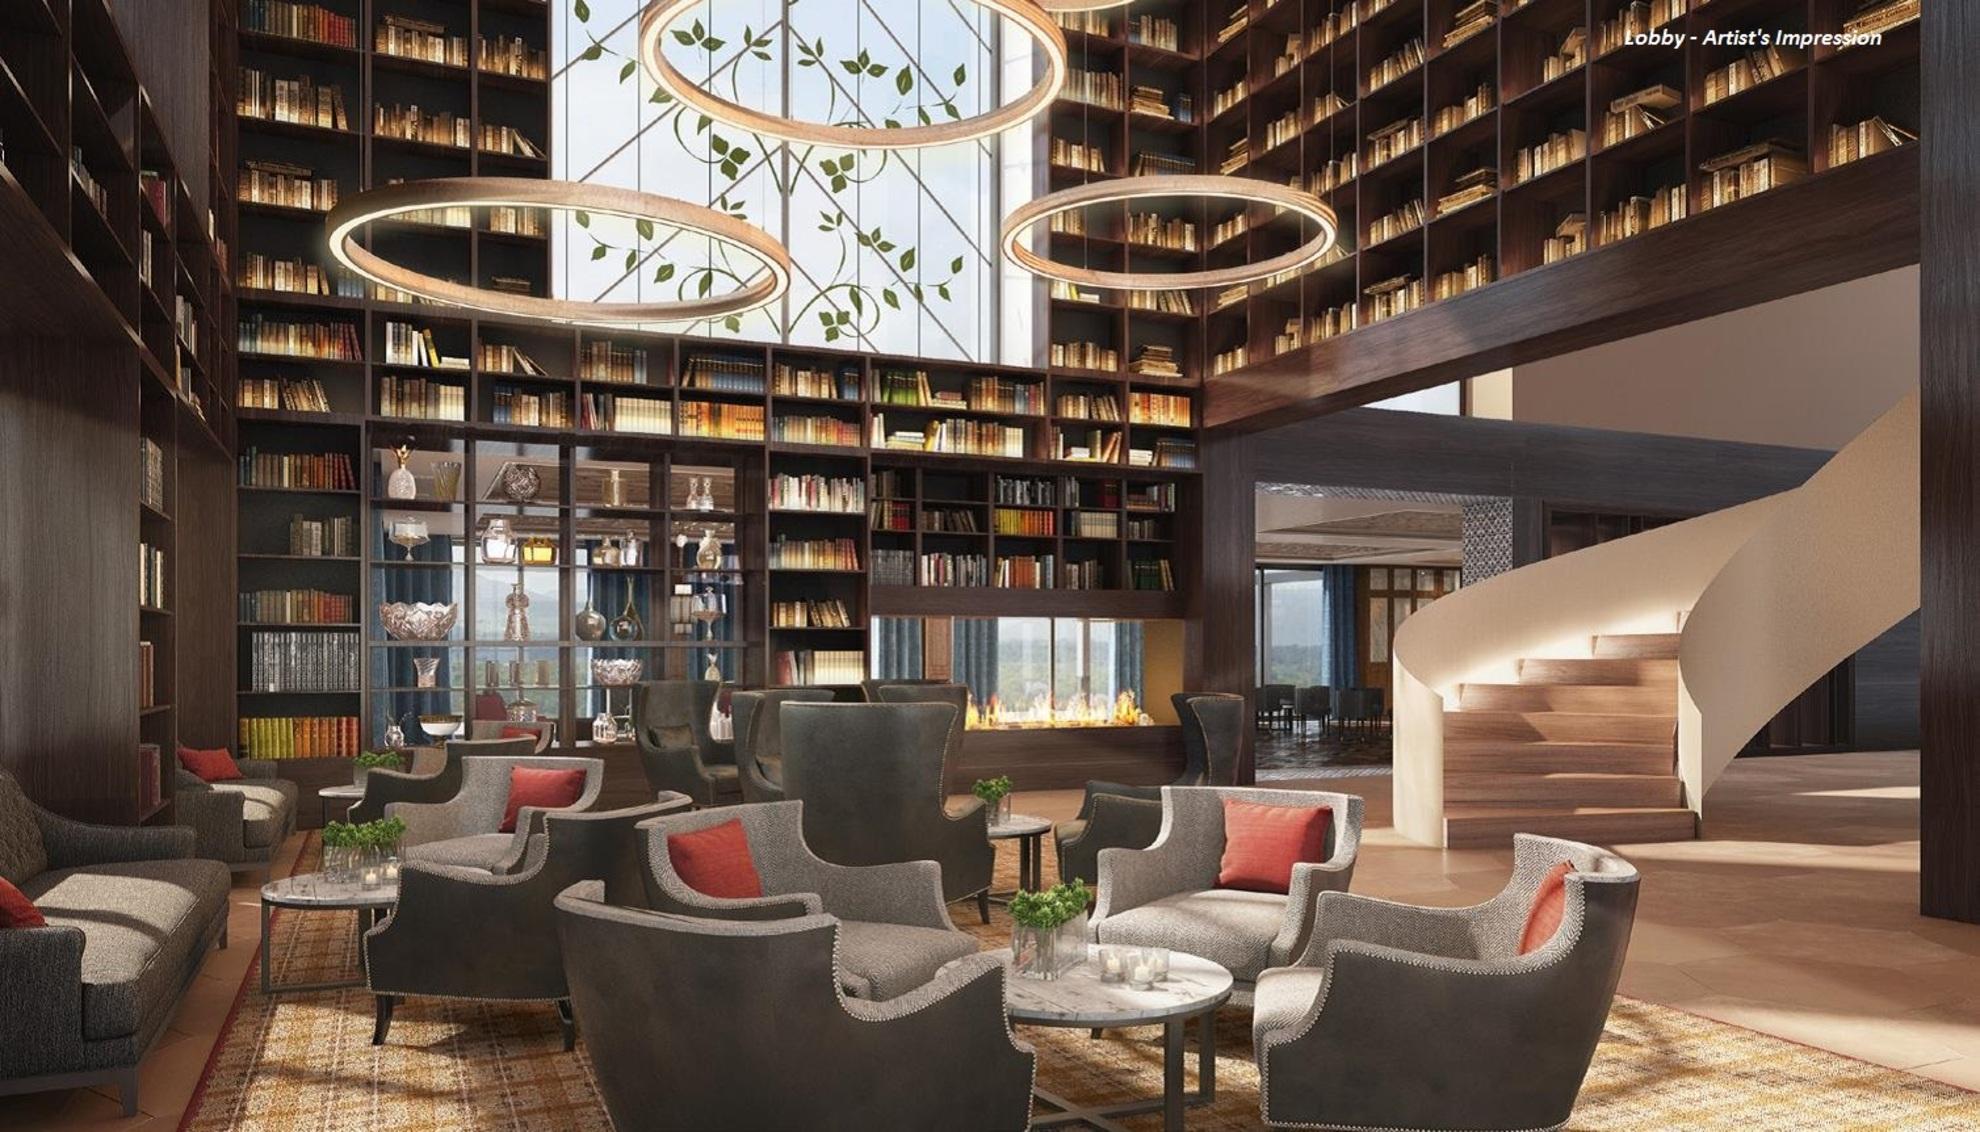 5 Star Hotels Kerry Five Ireland Wedding Venues Luxury Family The Dunloe Co